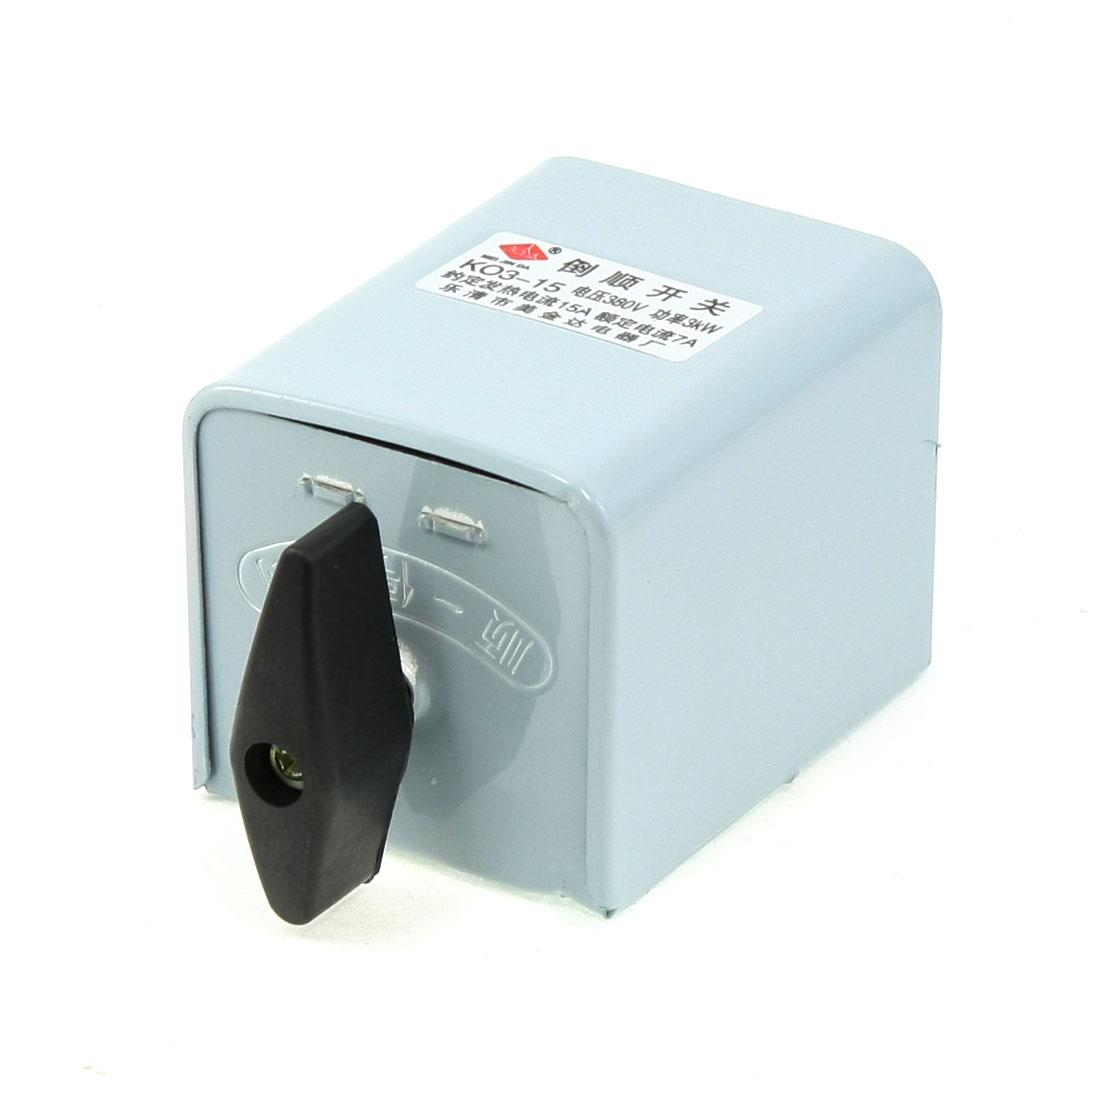 380V 3KW Rotary Motor Control Forward Reversing Changeover Switch KO3-15